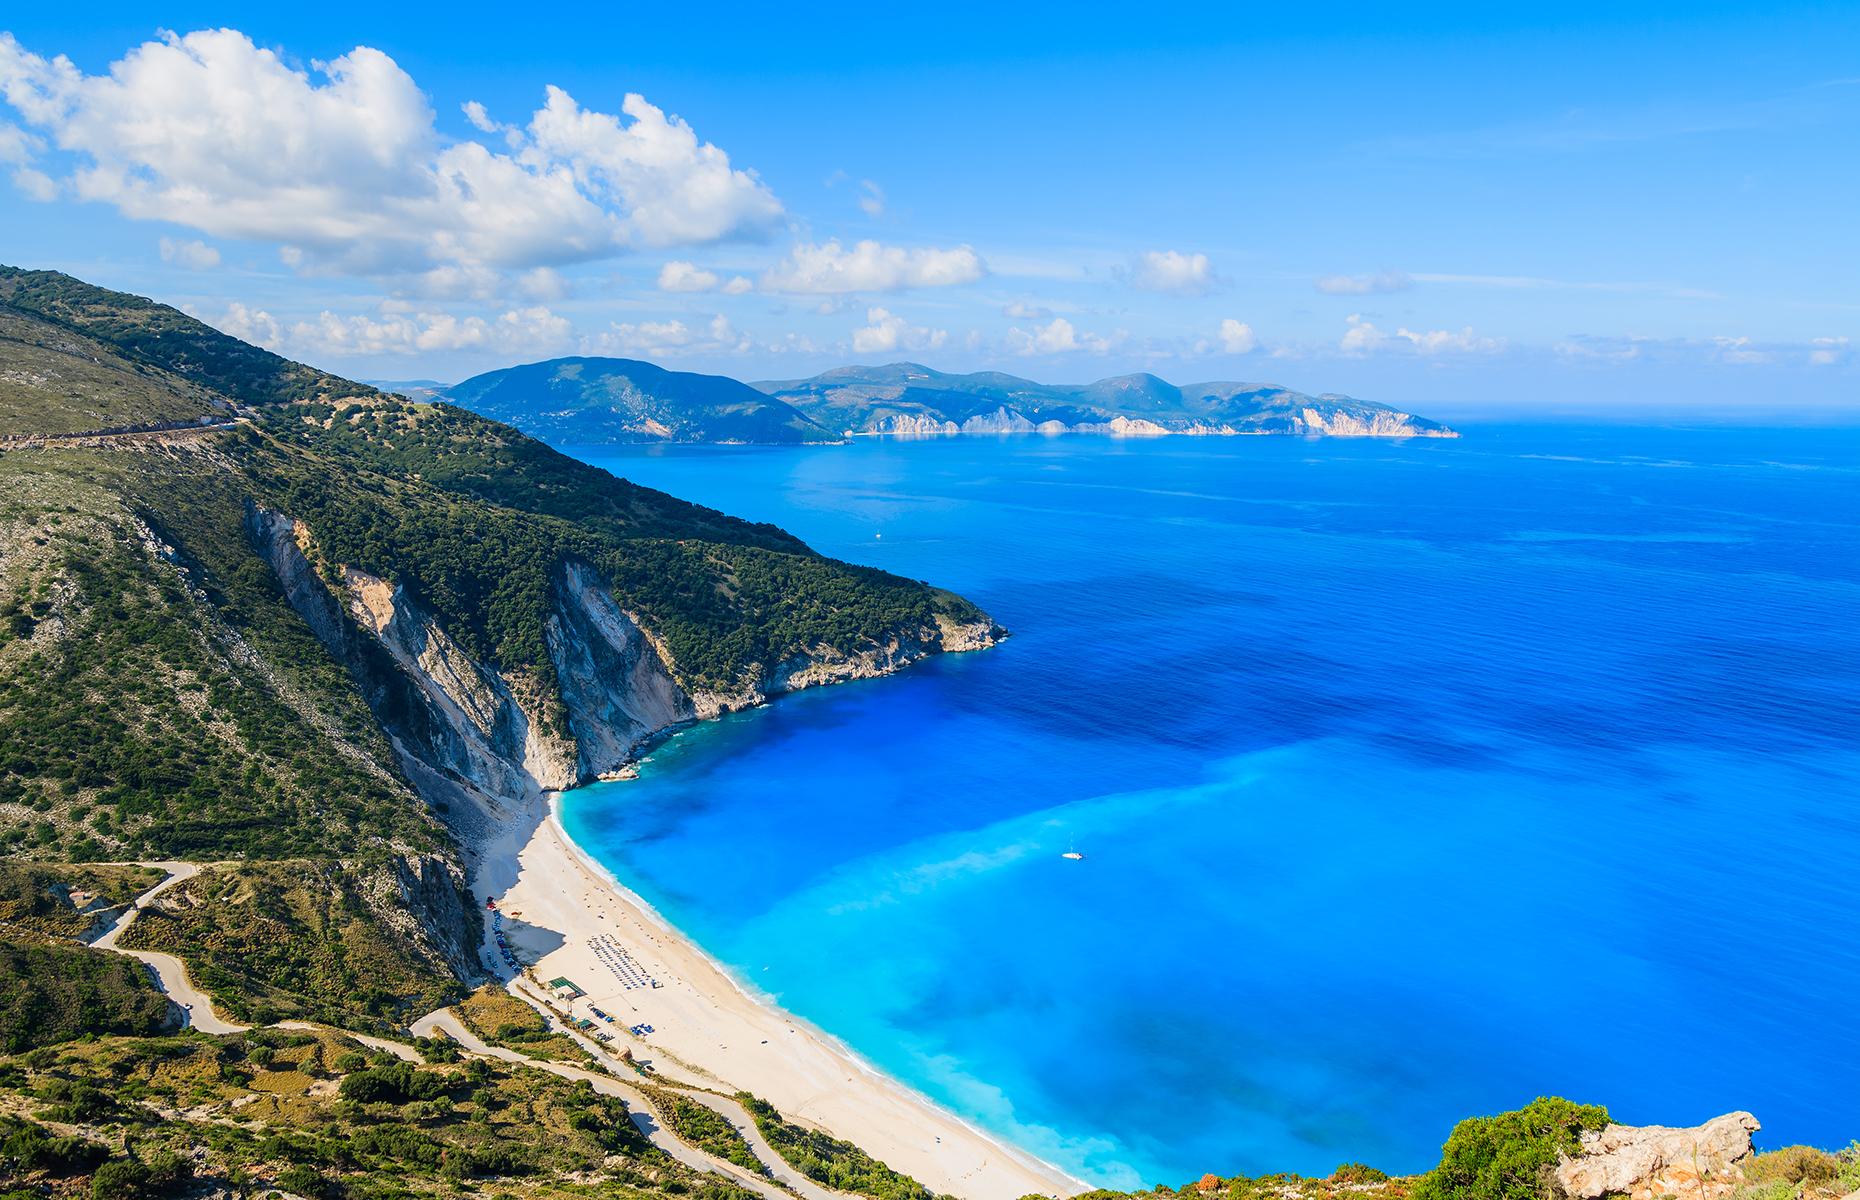 Myrtos Beach (Image: Pawel Kazmierczak/Shutterstock)